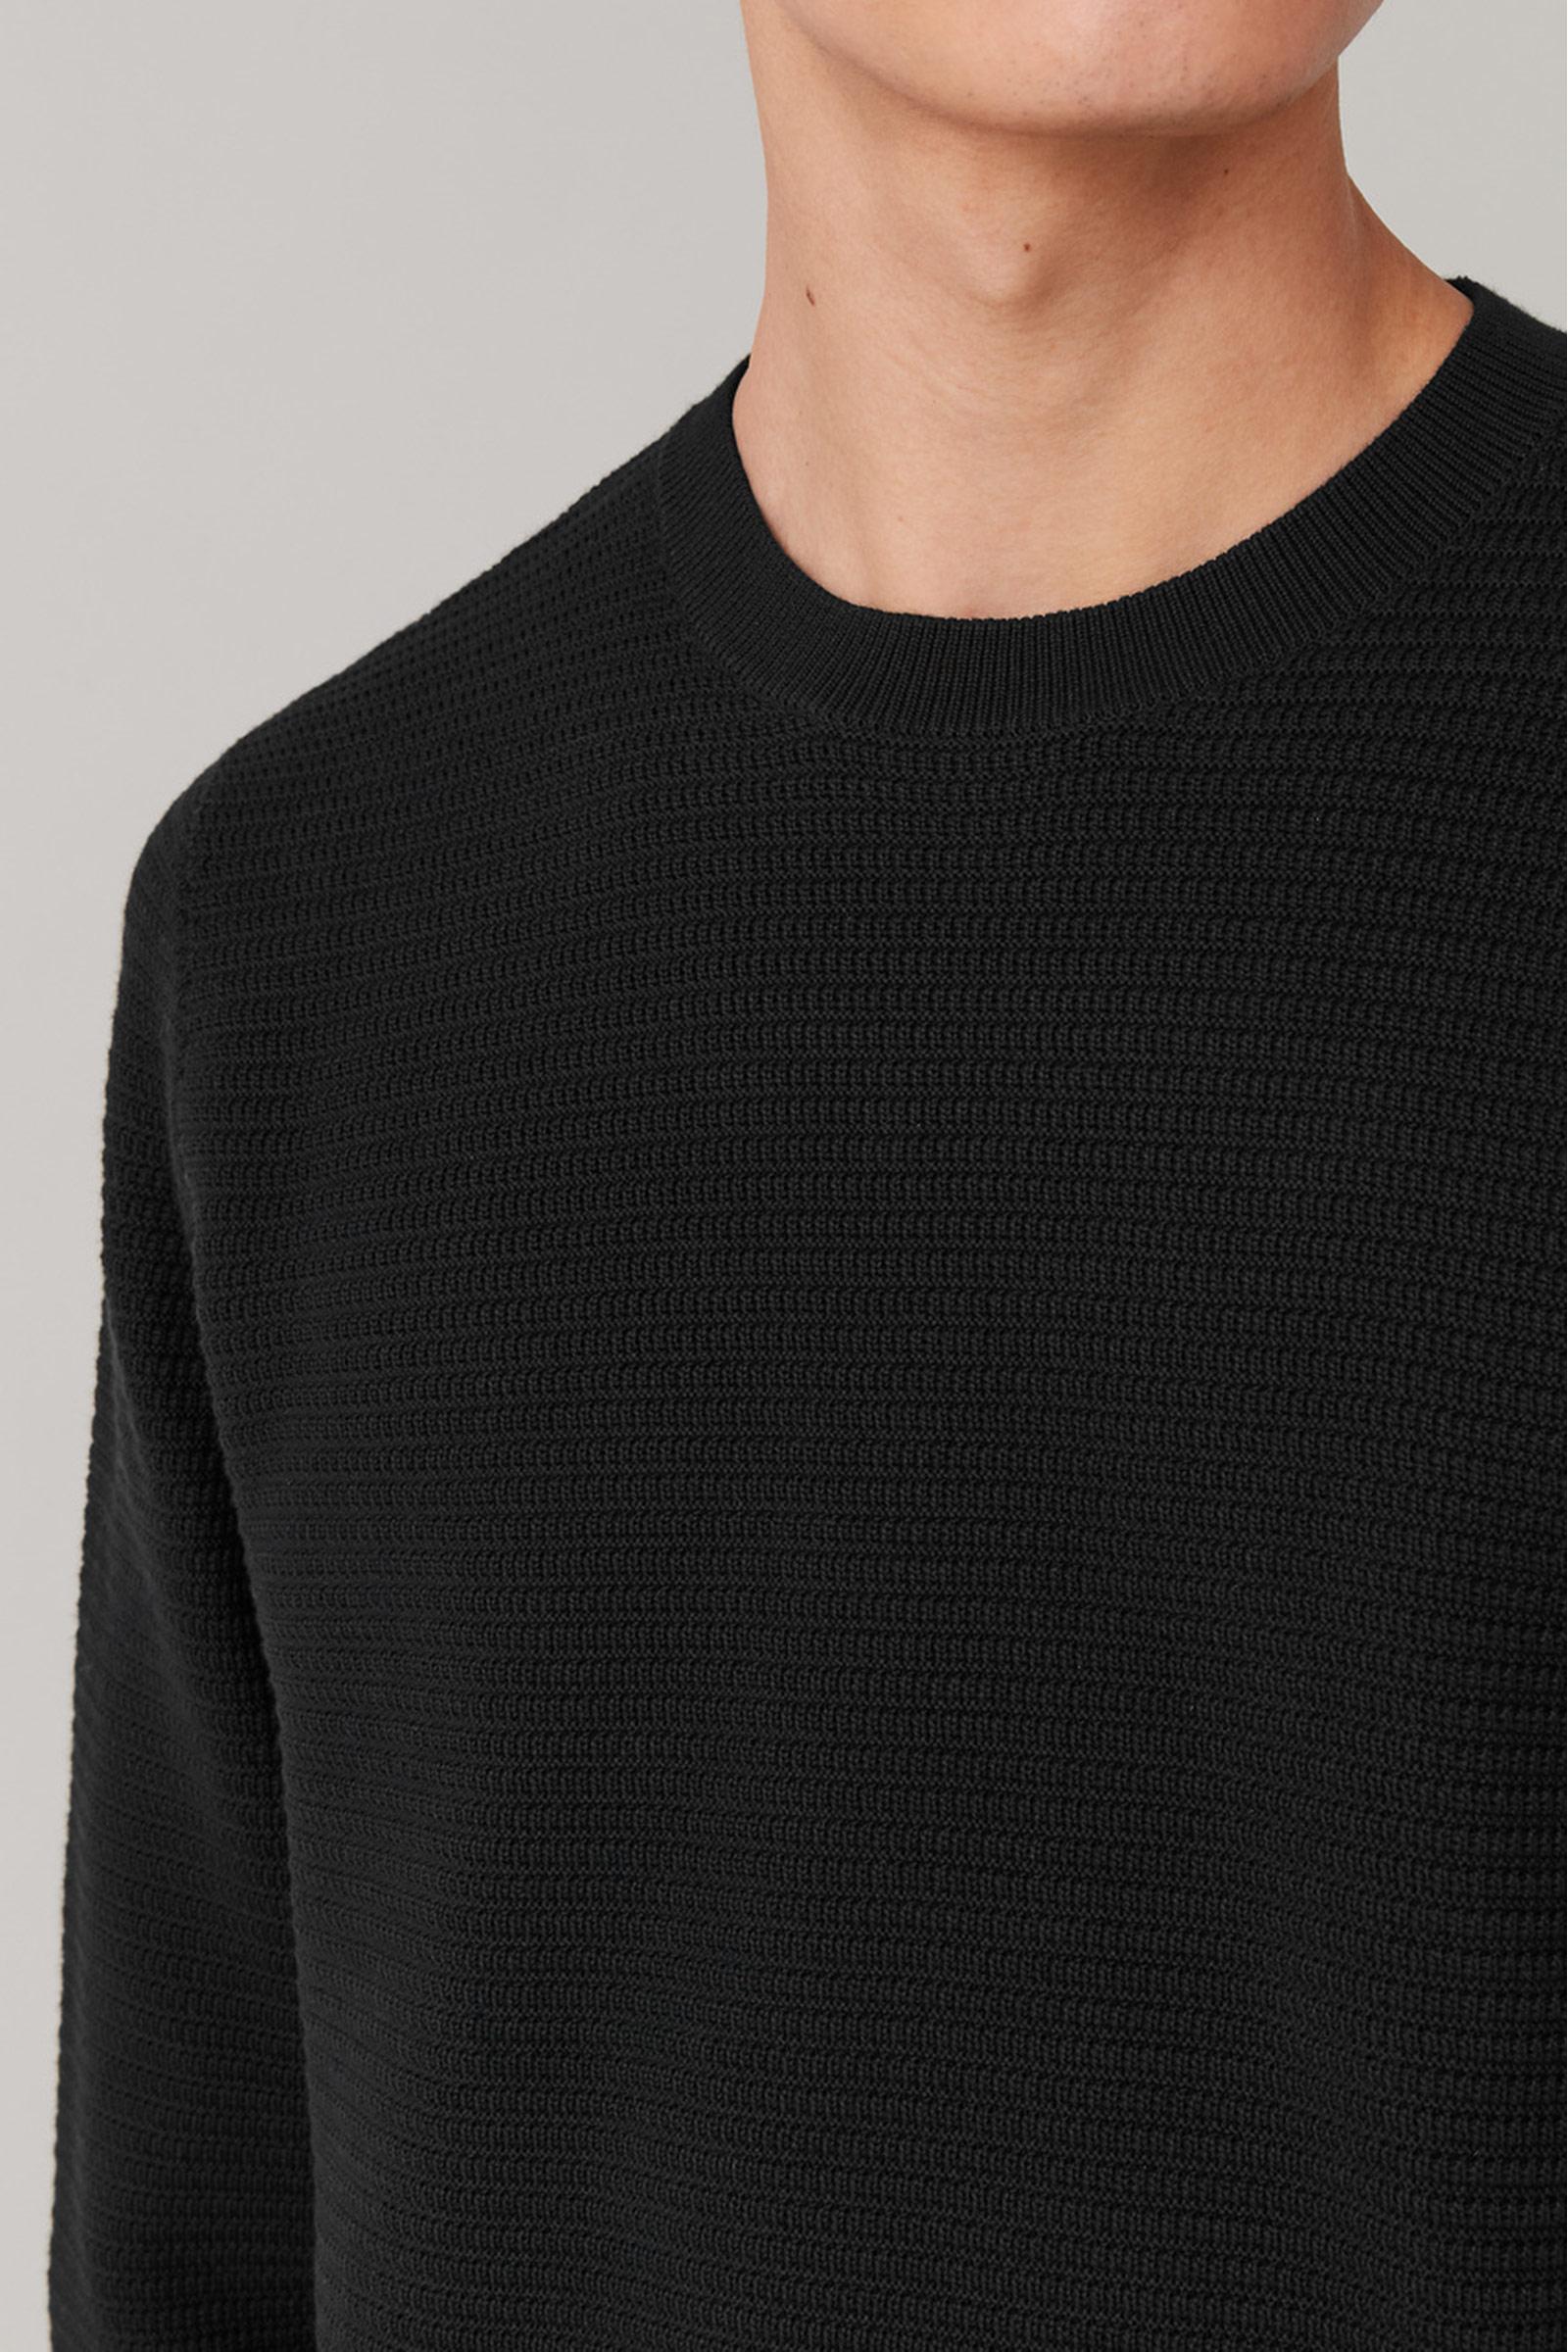 COS 텍스처드 니트 스웨터의 블랙컬러 ECOMLook입니다.